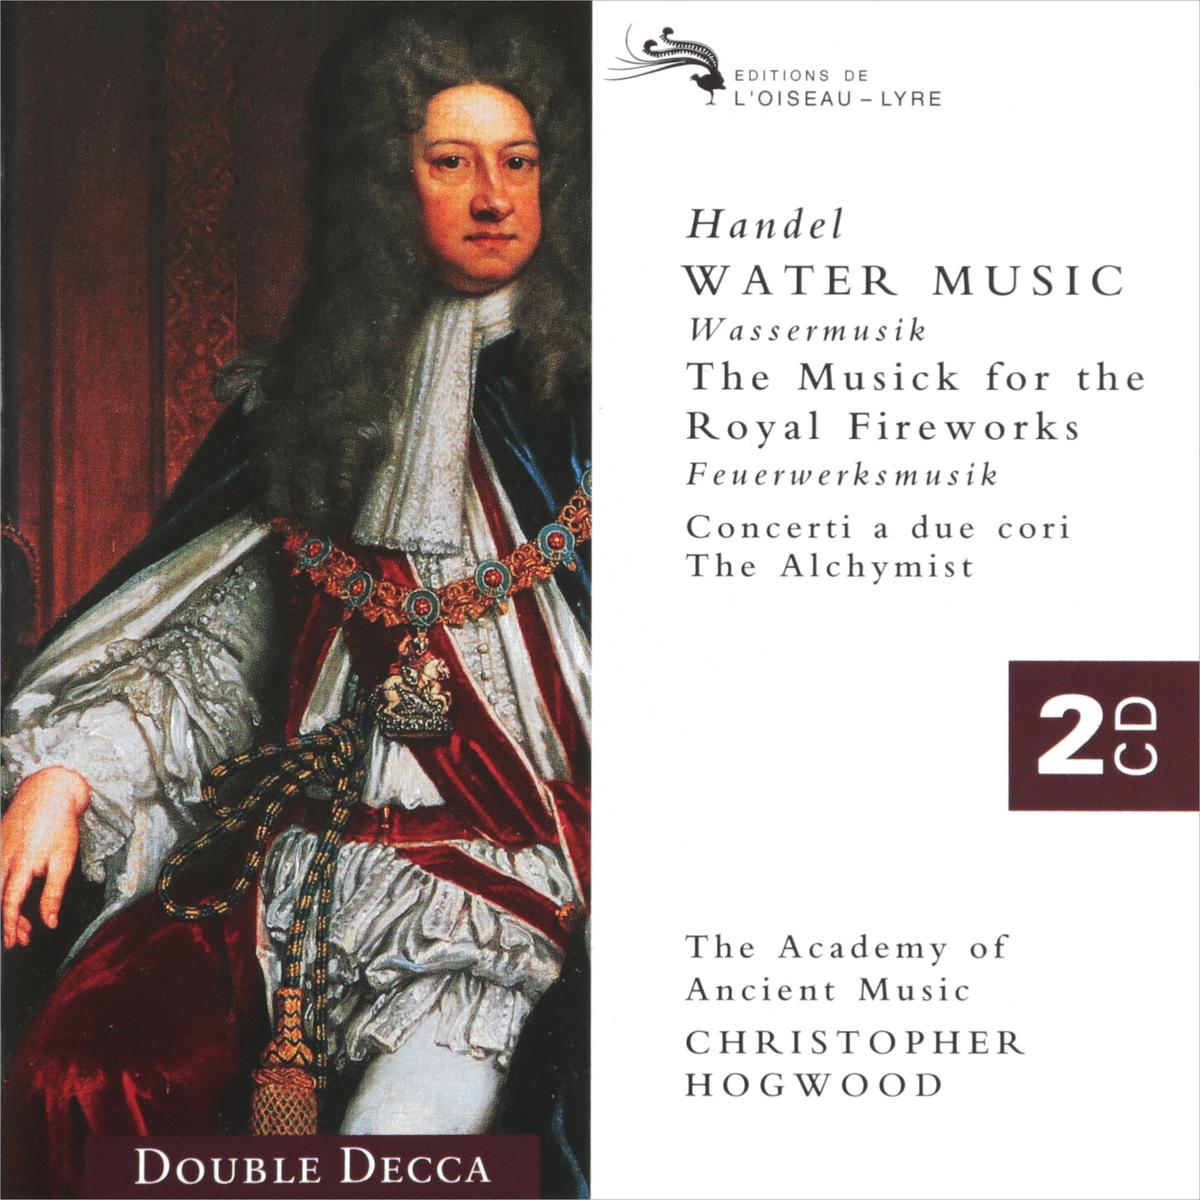 Кристофер Хогвуд,Verdez Handel. Water Music. Fireworks. Hogwood (2 CD) кристофер хогвуд the academy of ancient music pachelbel christopher hogwood canon